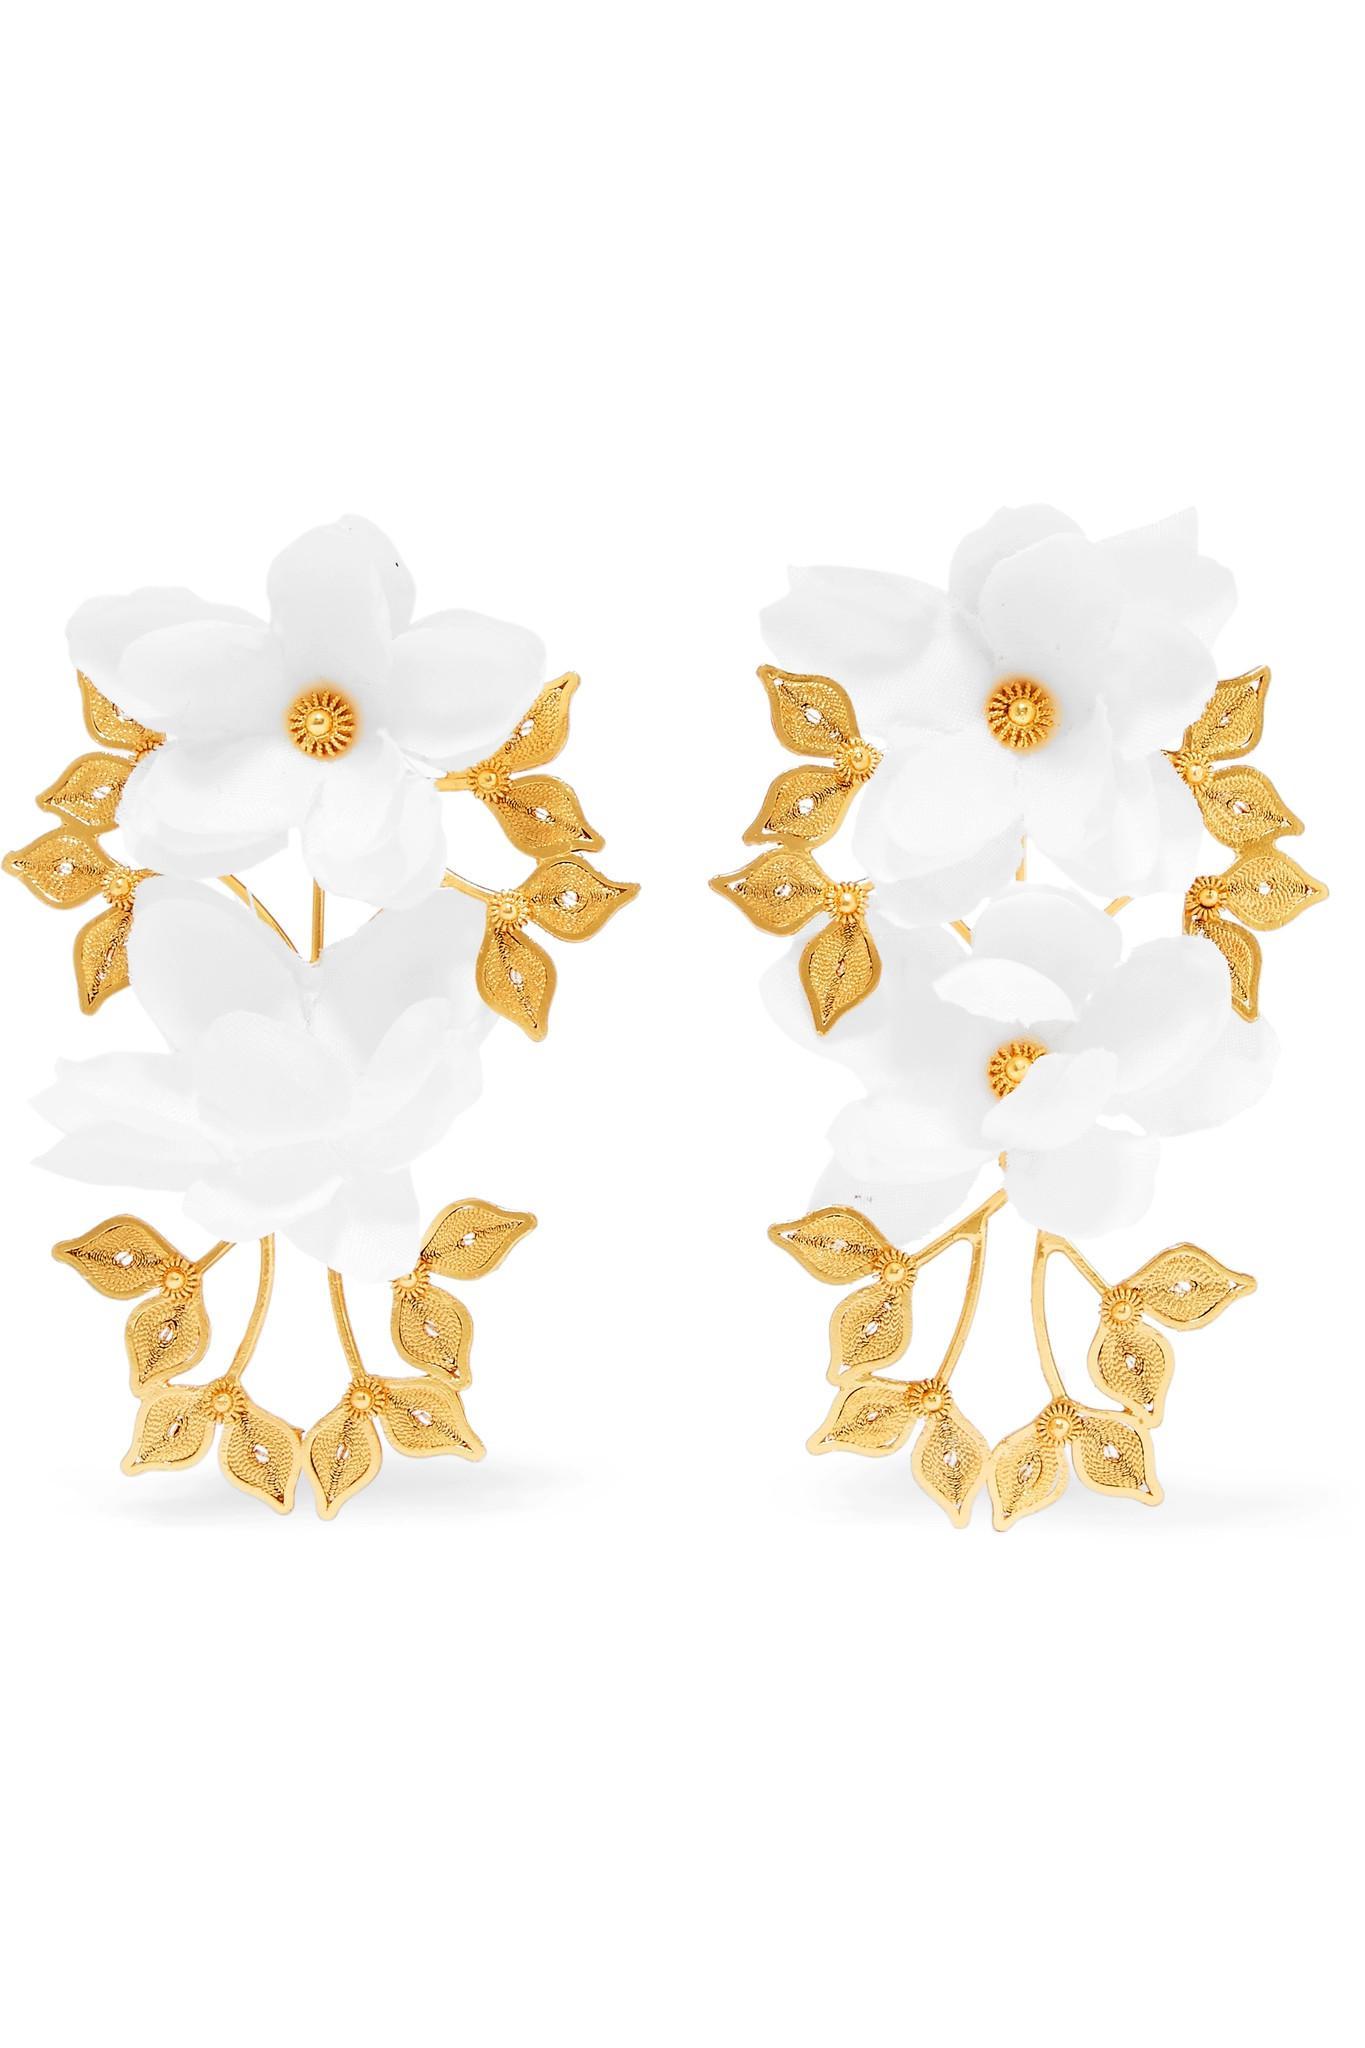 Mallarino Greta Gold Vermeil Silk Earrings DACLnCW